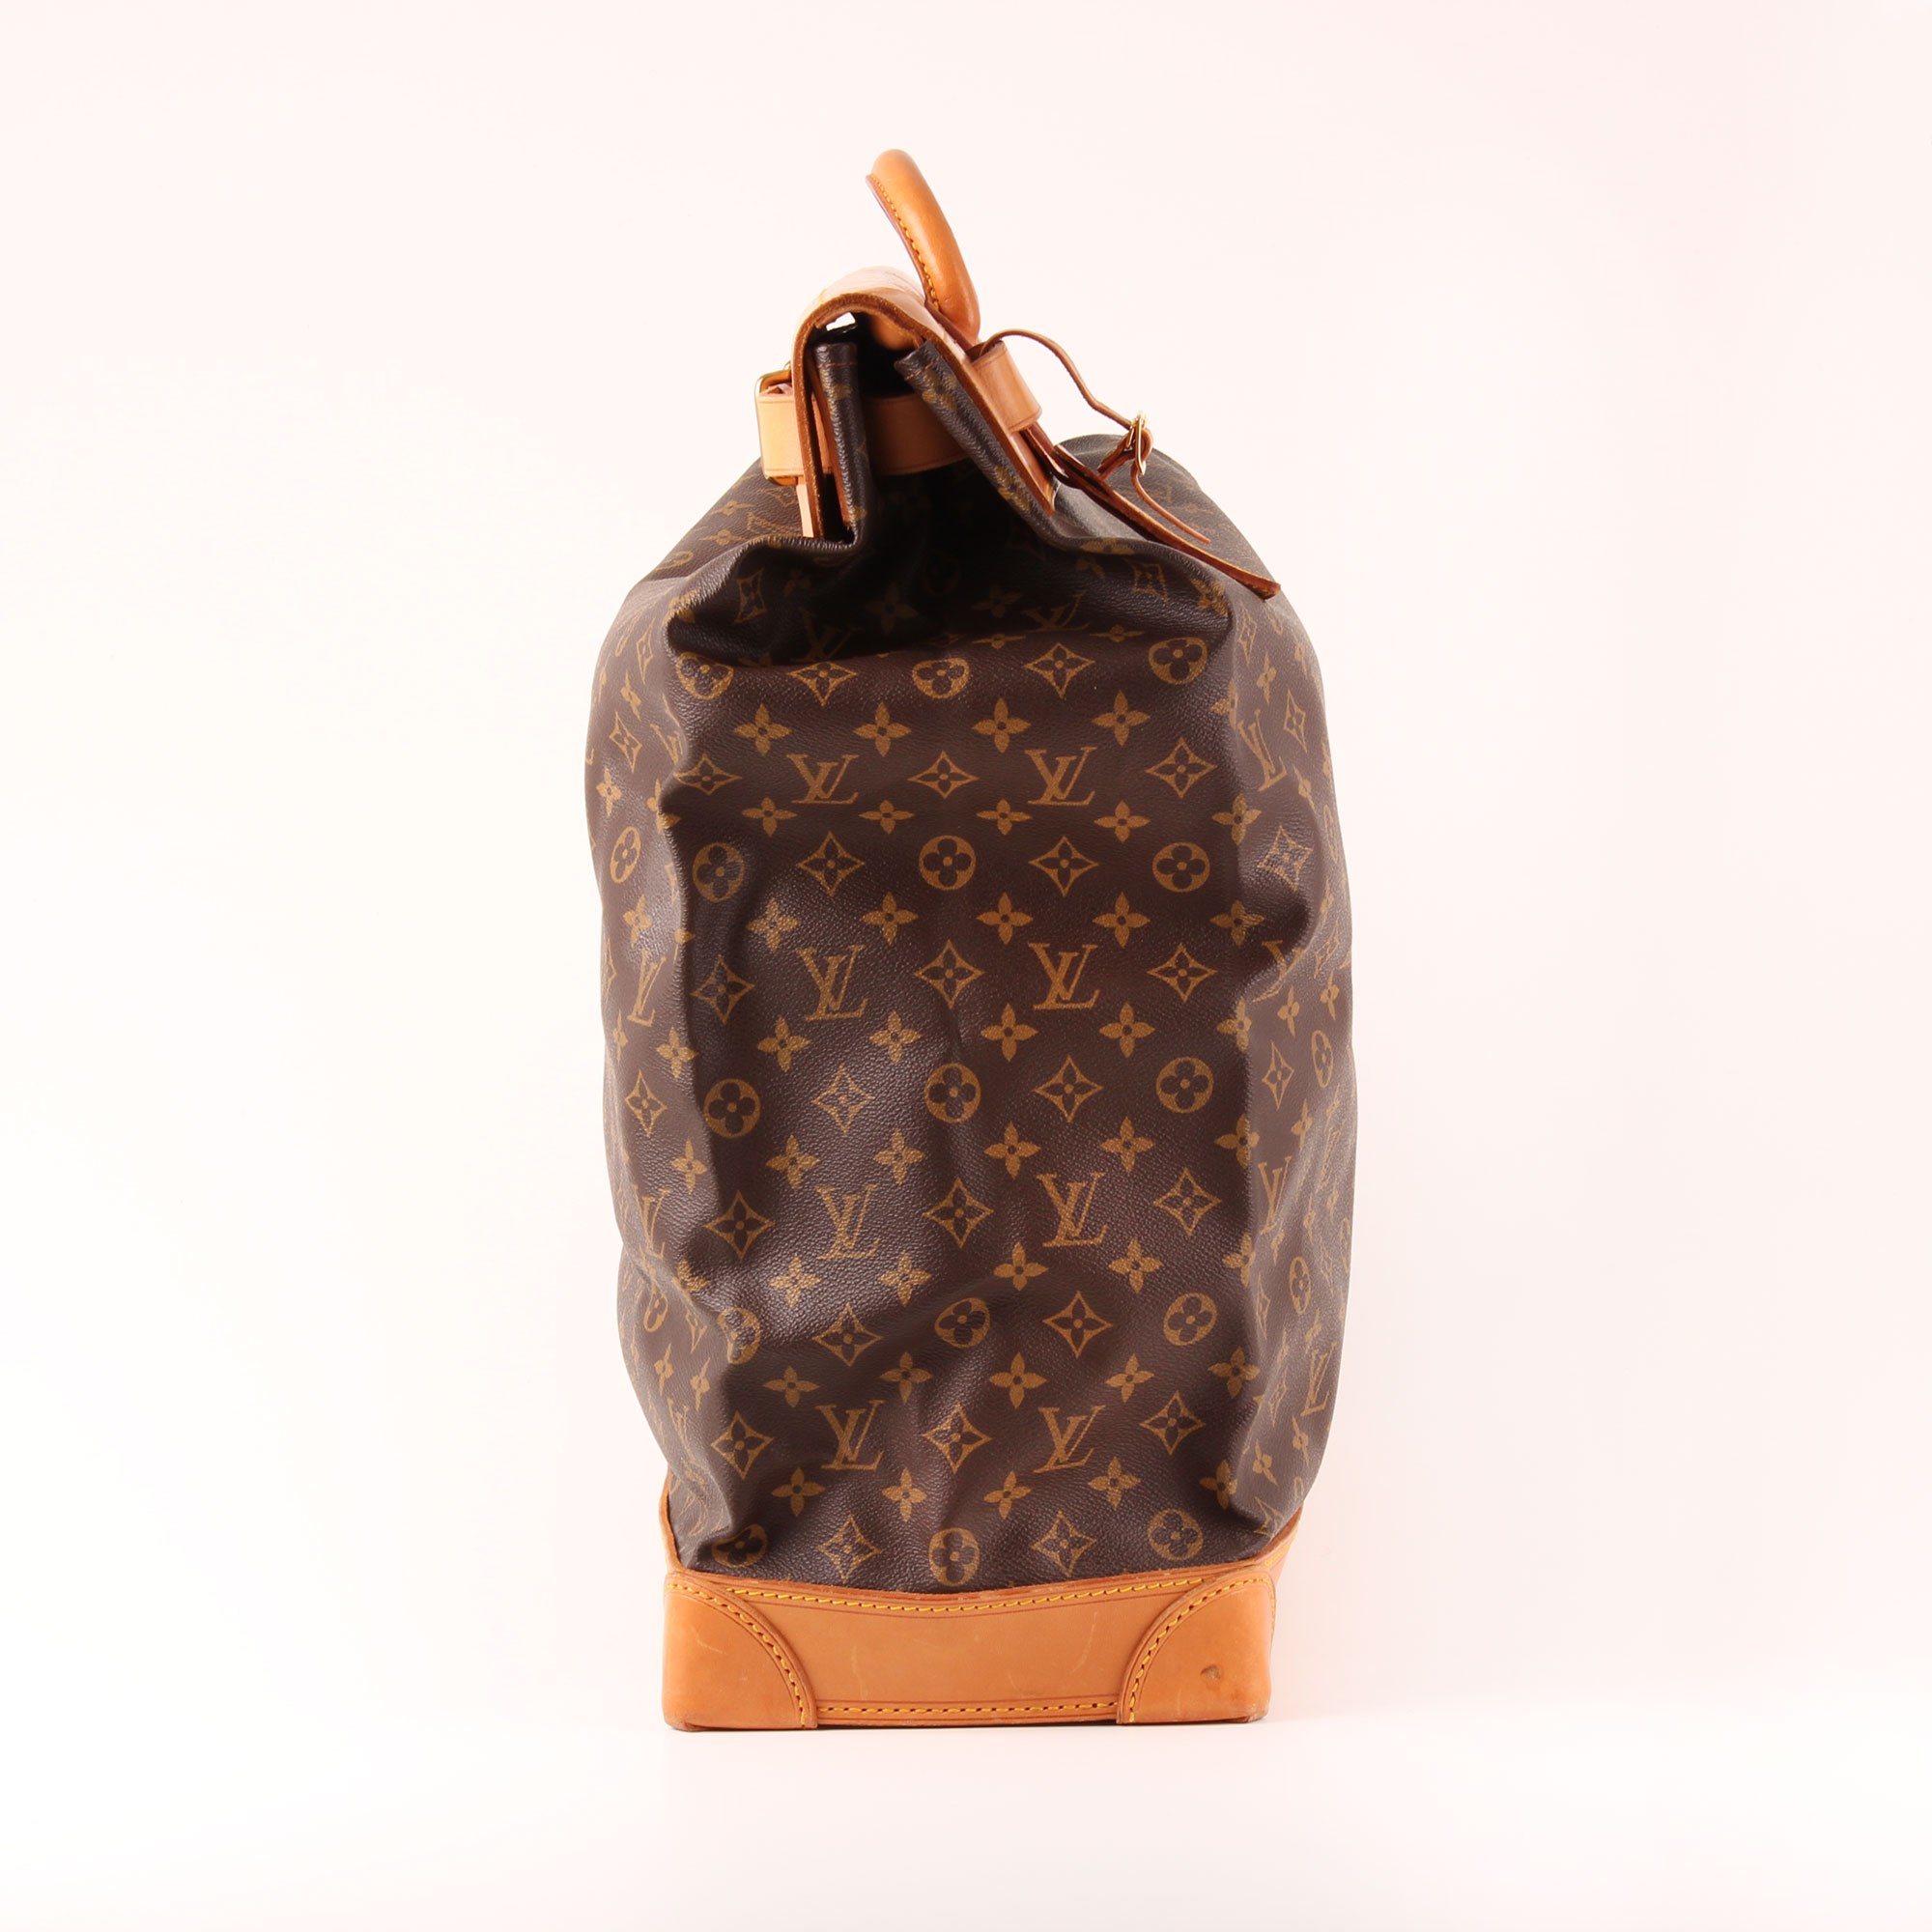 10621205b Bolsa de viaje Louis Vuitton Steamer 45 Monogram I CBL Bags